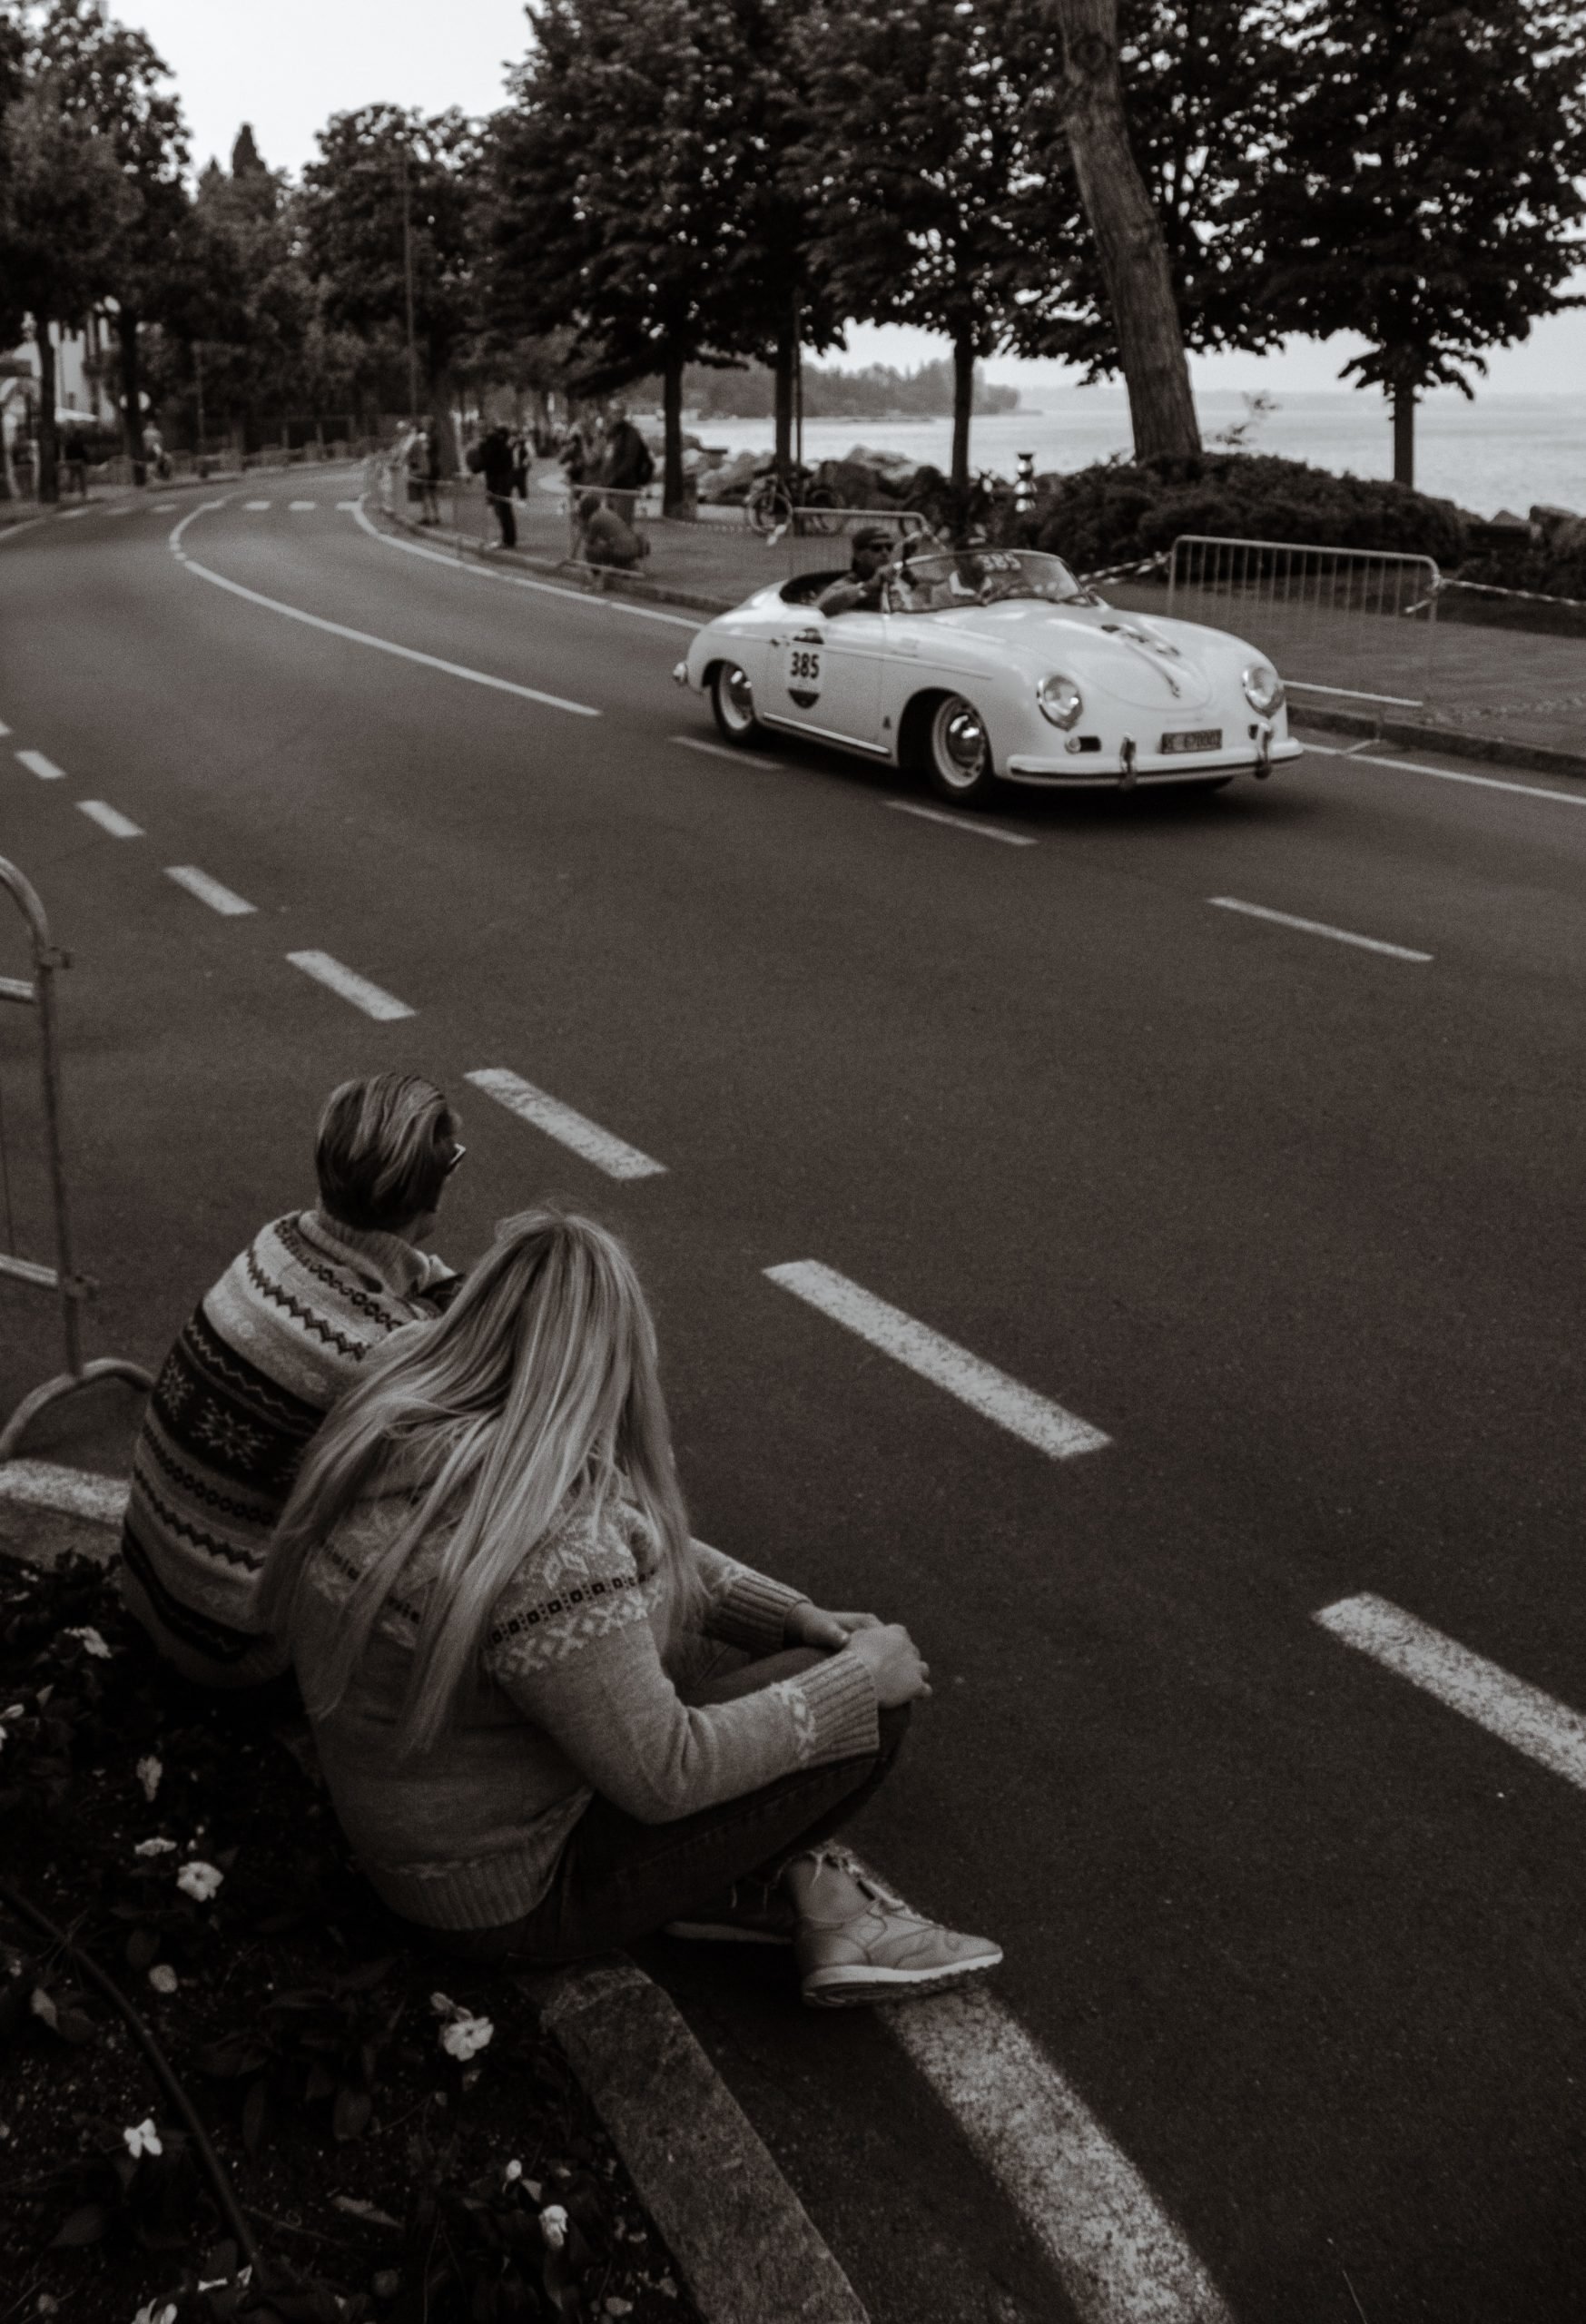 Foto: Lorenzo Mazzoleni para Unsplash